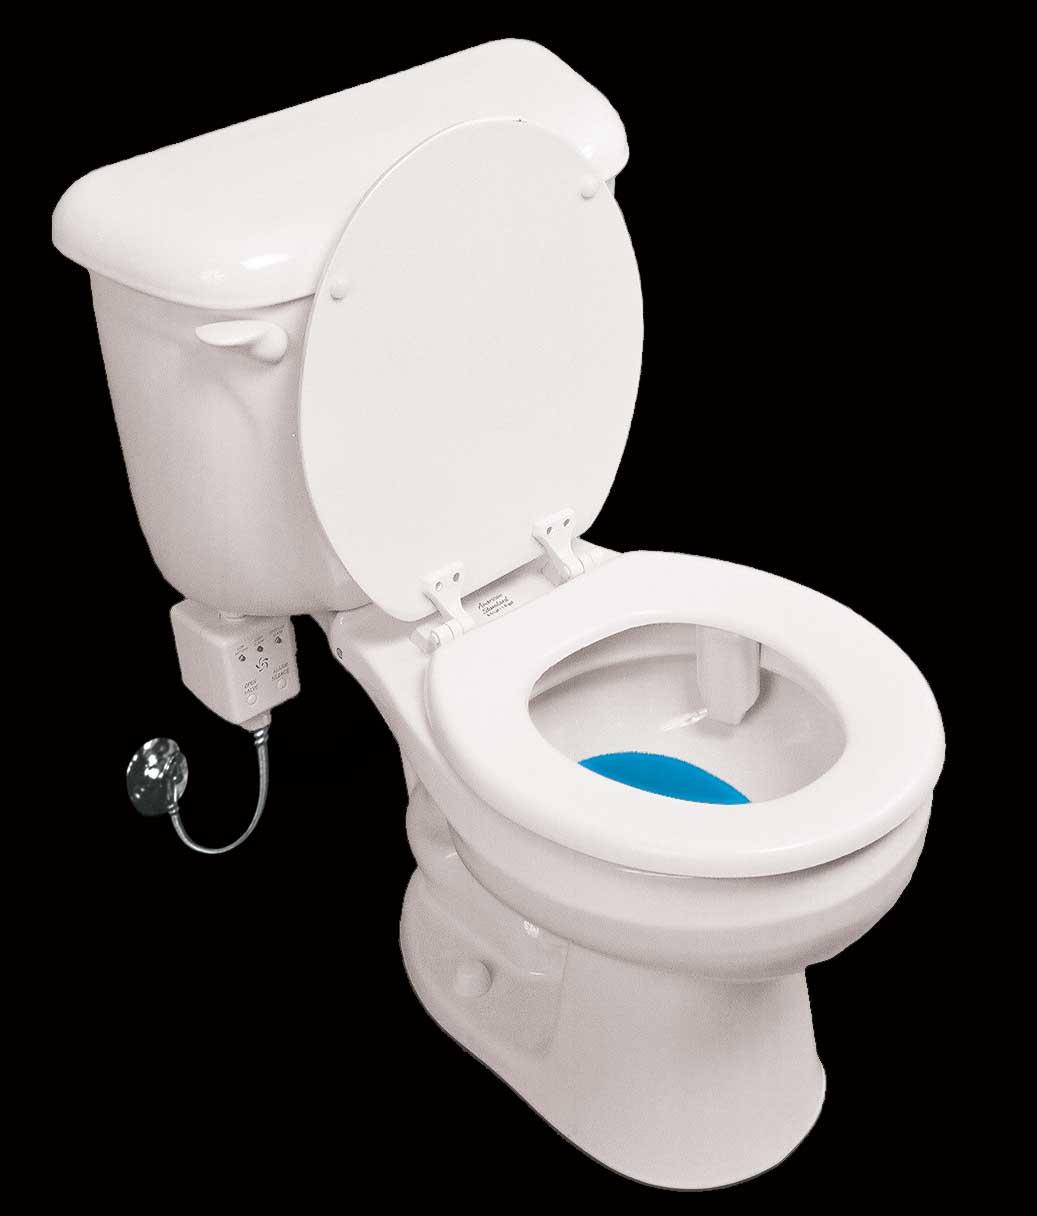 X-Burner's room Toilet